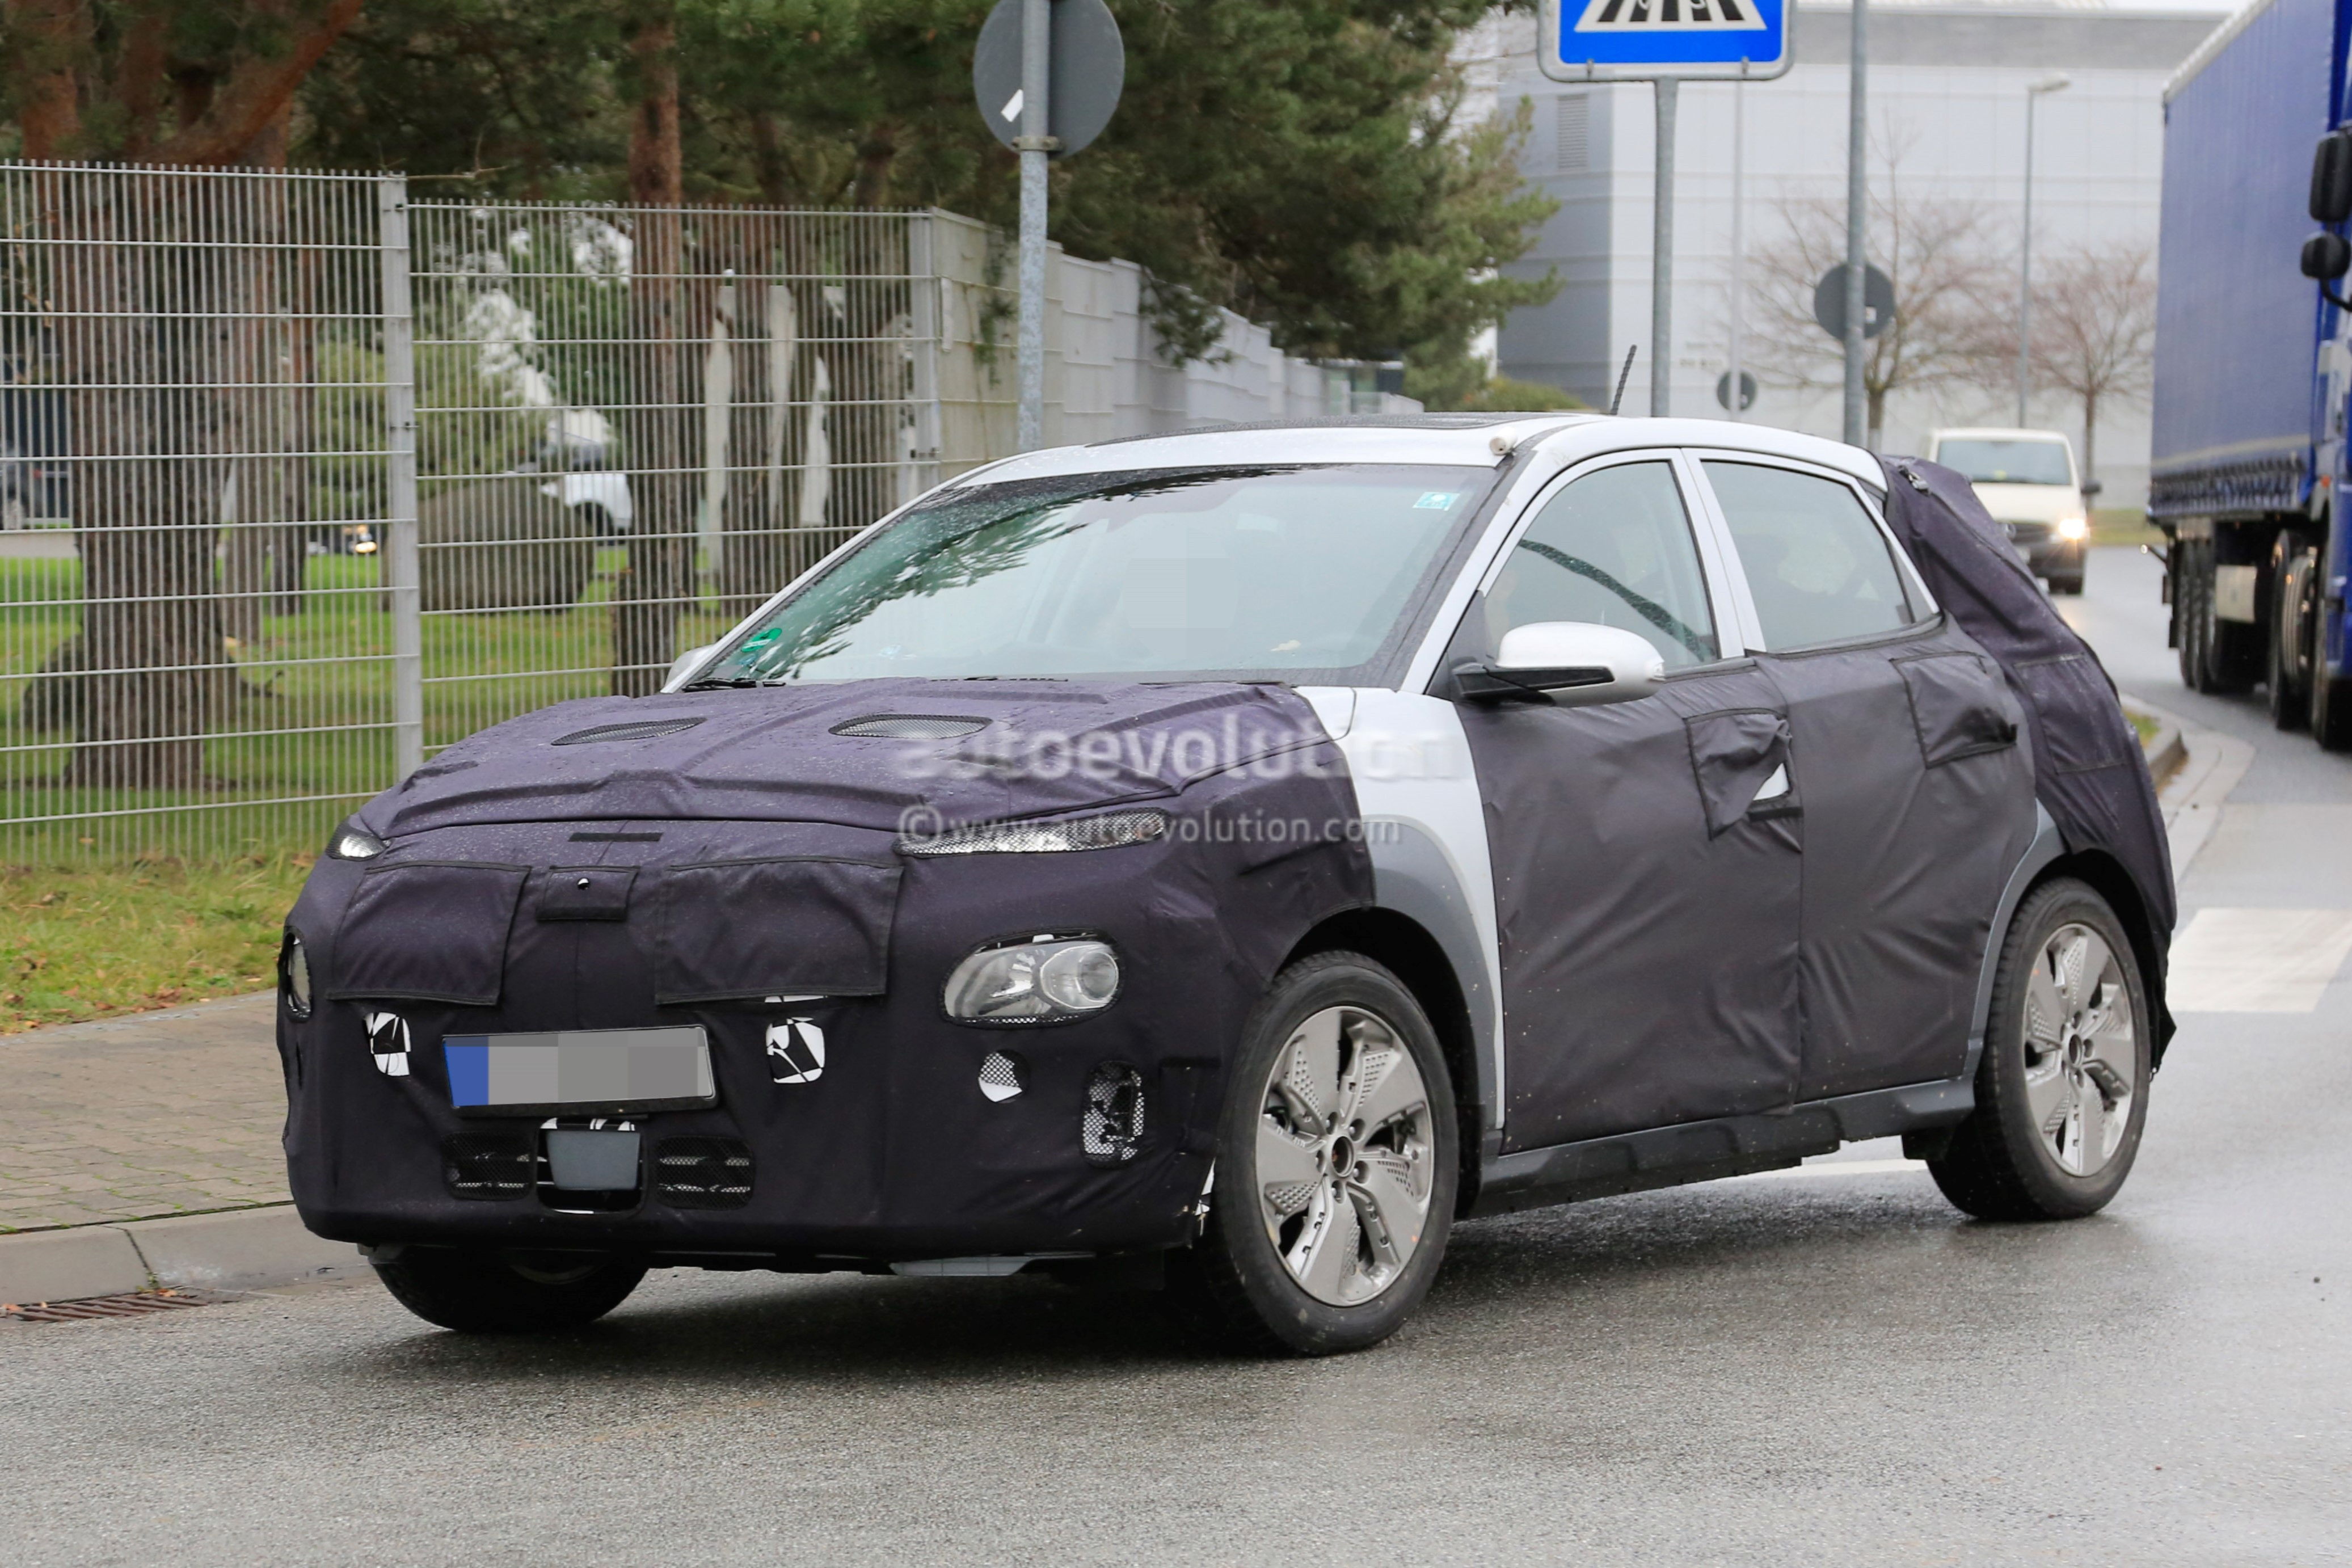 Opel Adam S 2018 >> Spyshots: 2018 Hyundai Kona Electric SUV Caught Testing In Germany - autoevolution